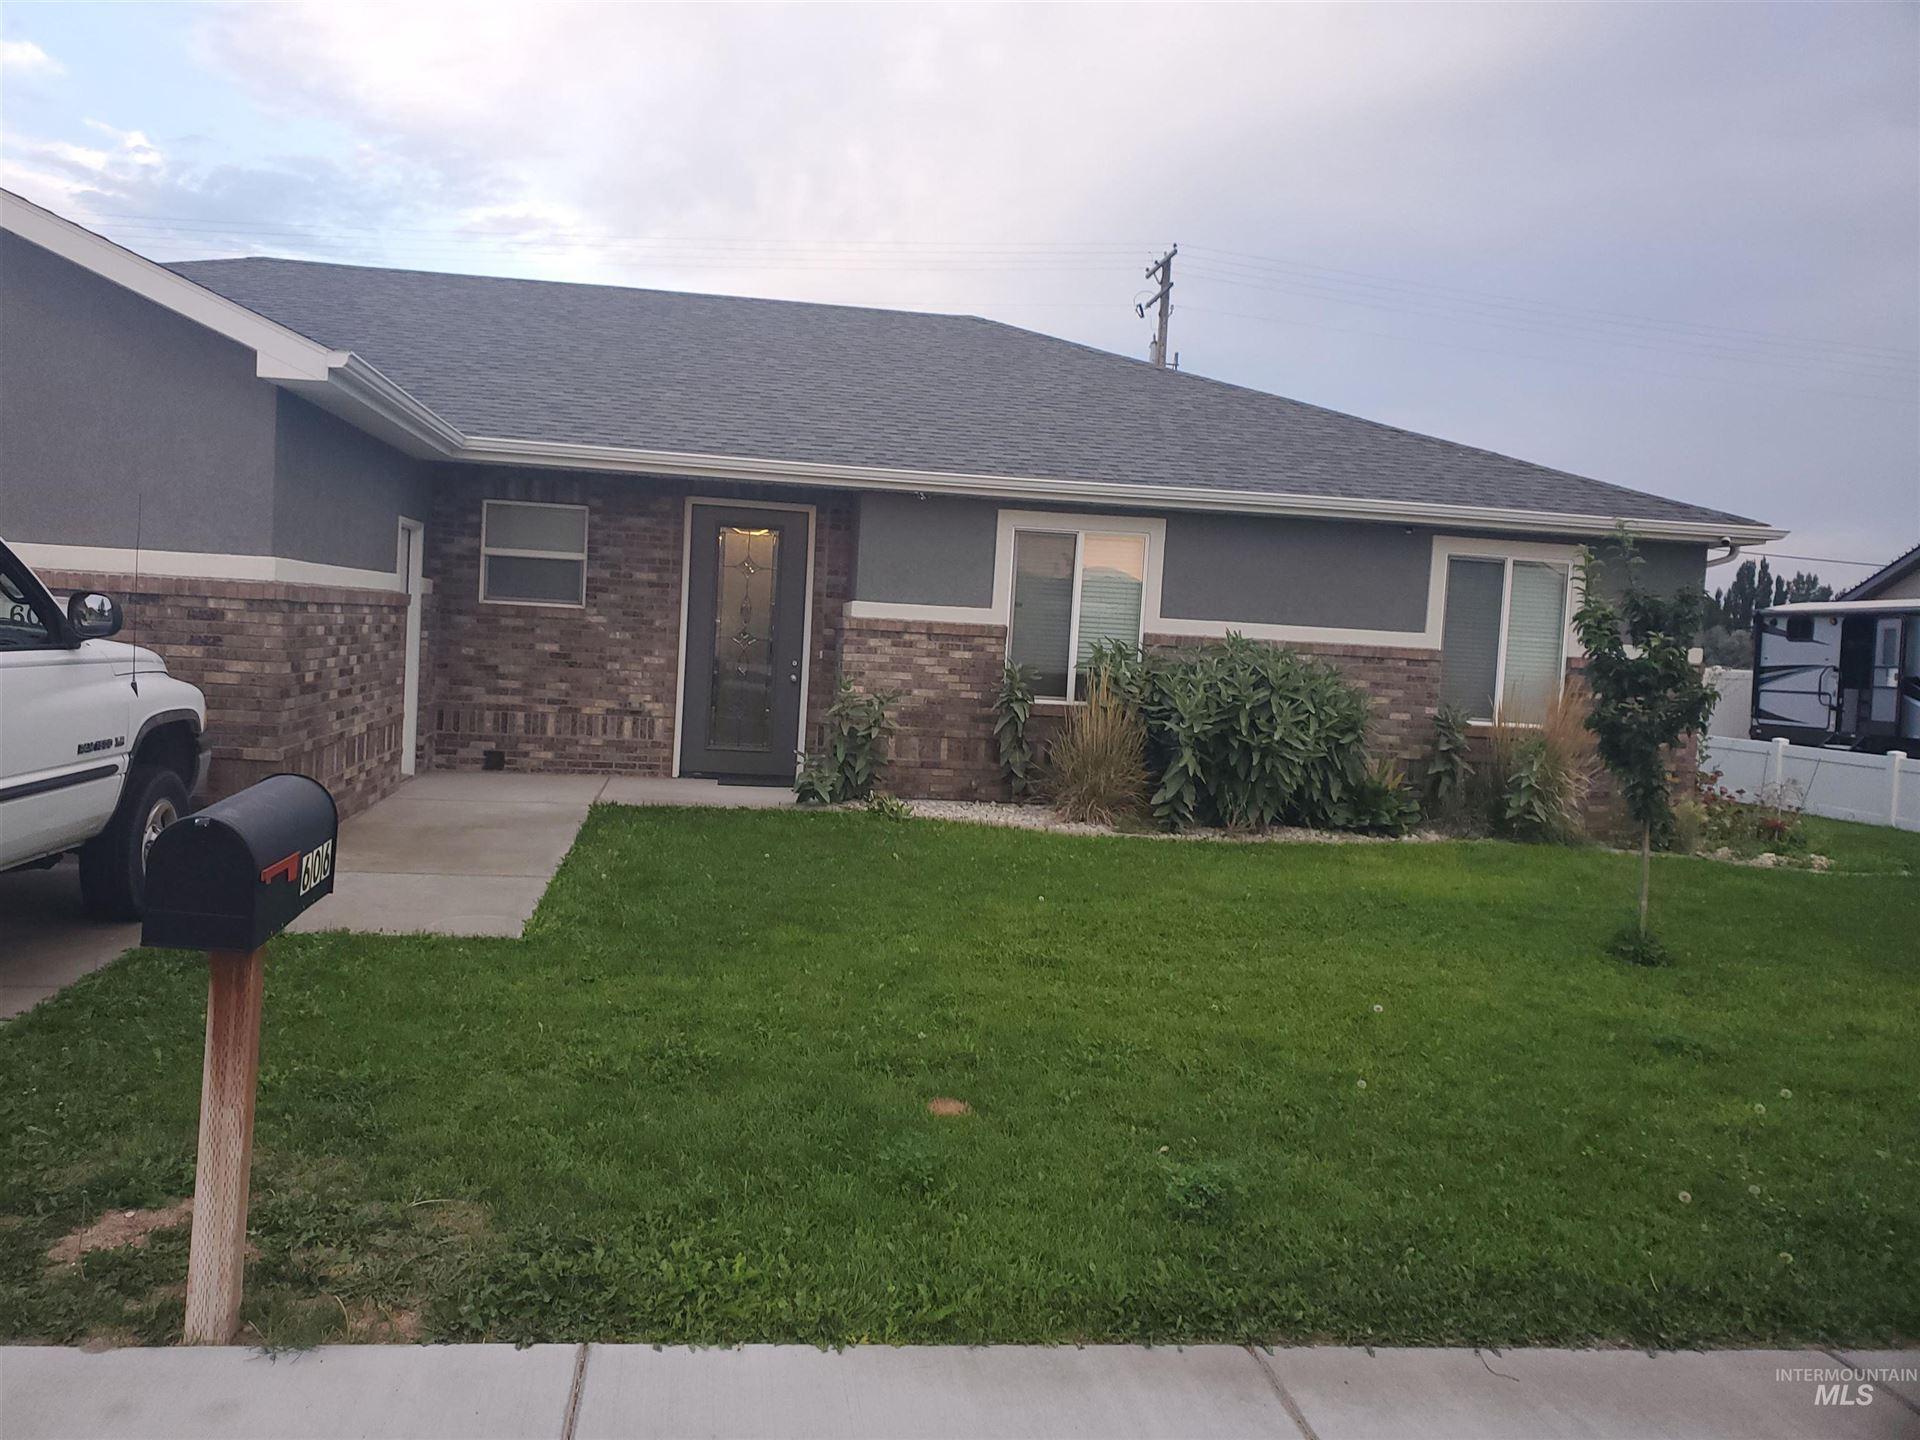 606 Lochsa Loop, Heyburn, ID 83336 - MLS#: 98815675